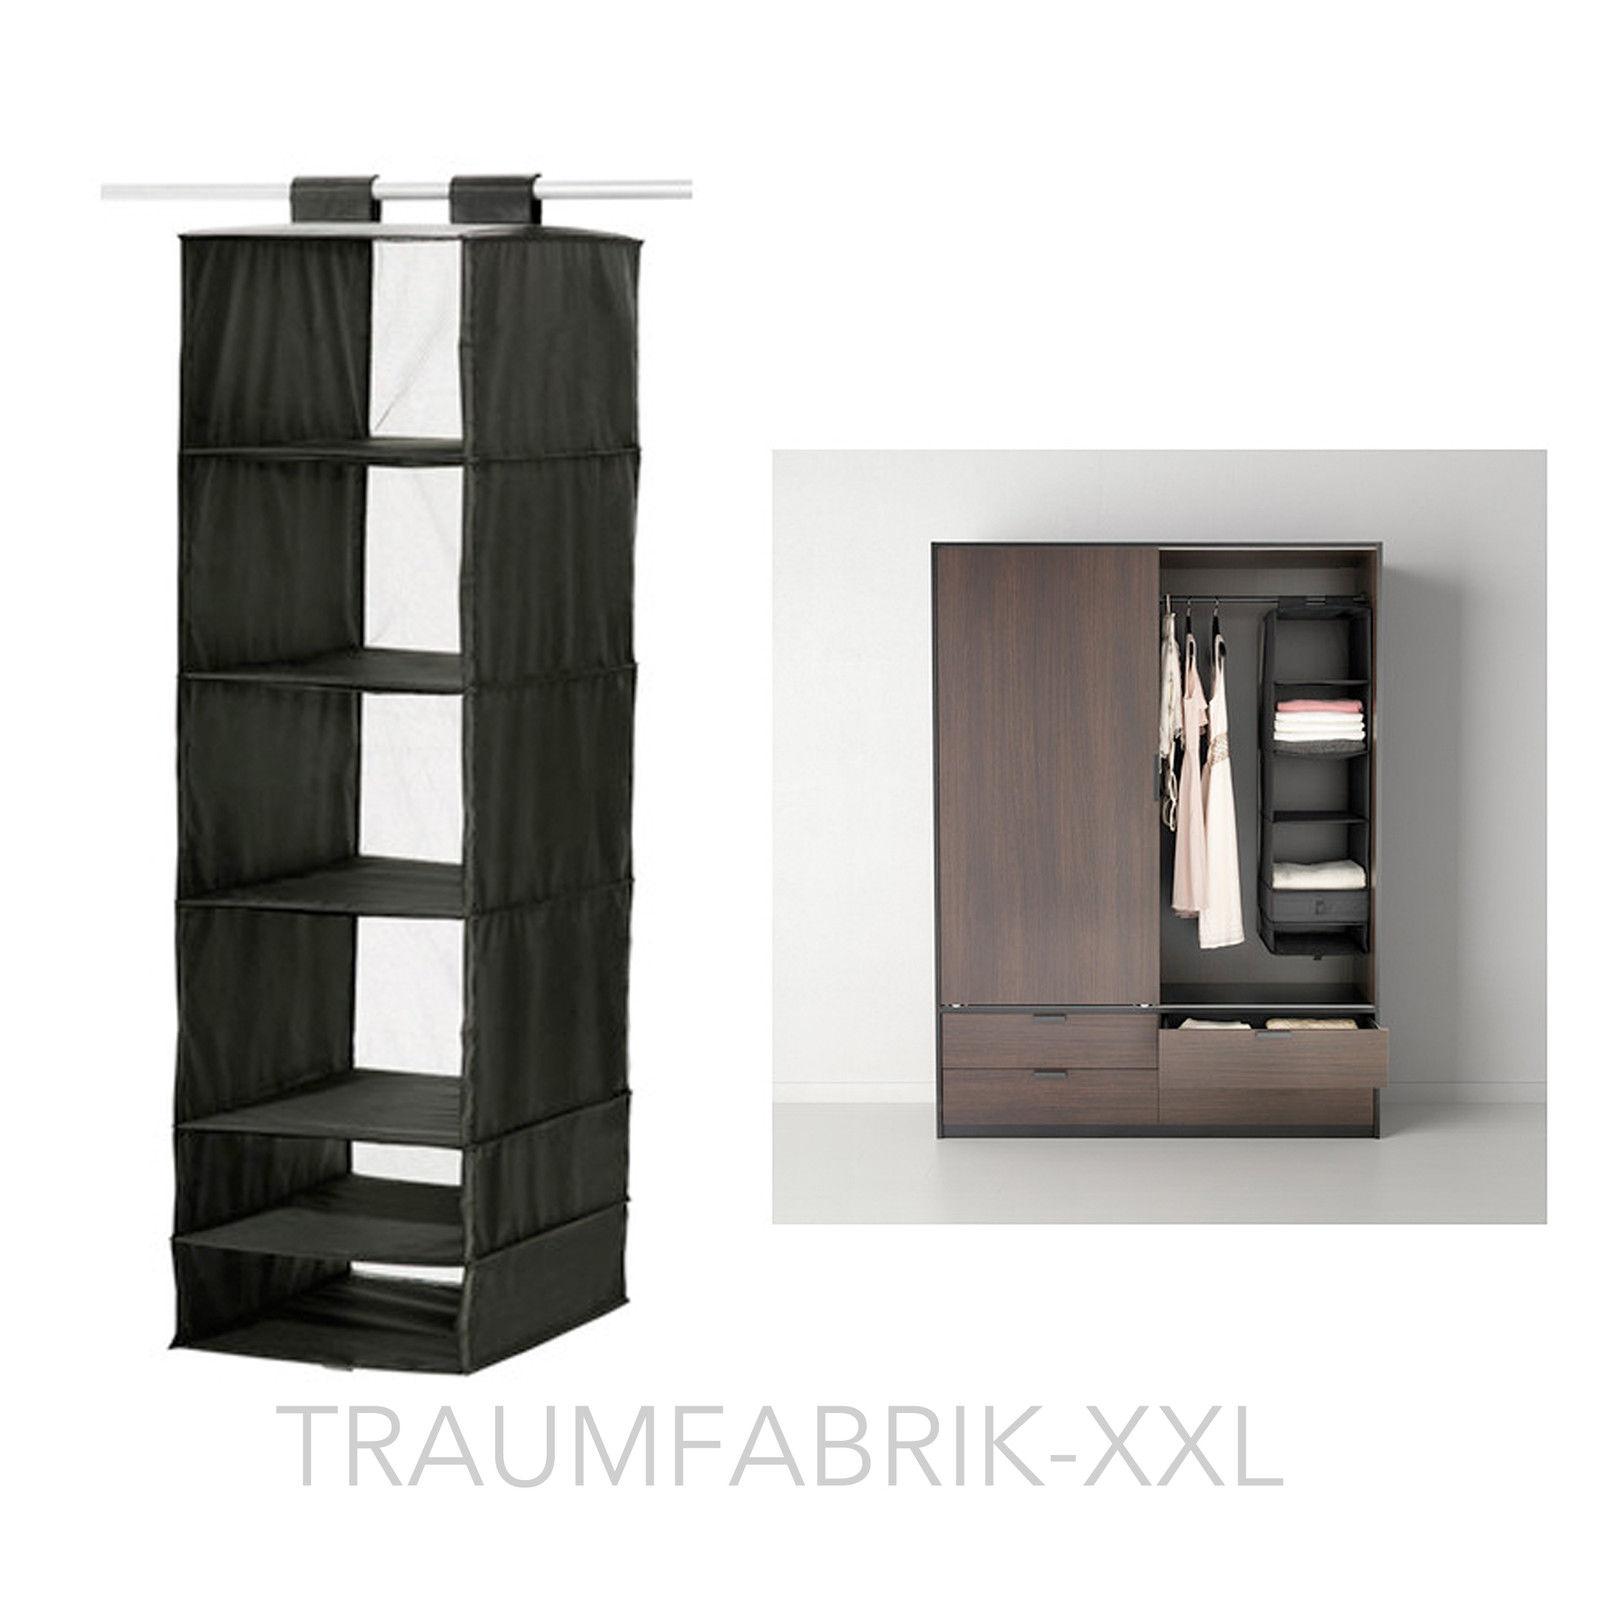 ikea h ngeaufbewahrung schuhregal regal garderobenh nger. Black Bedroom Furniture Sets. Home Design Ideas